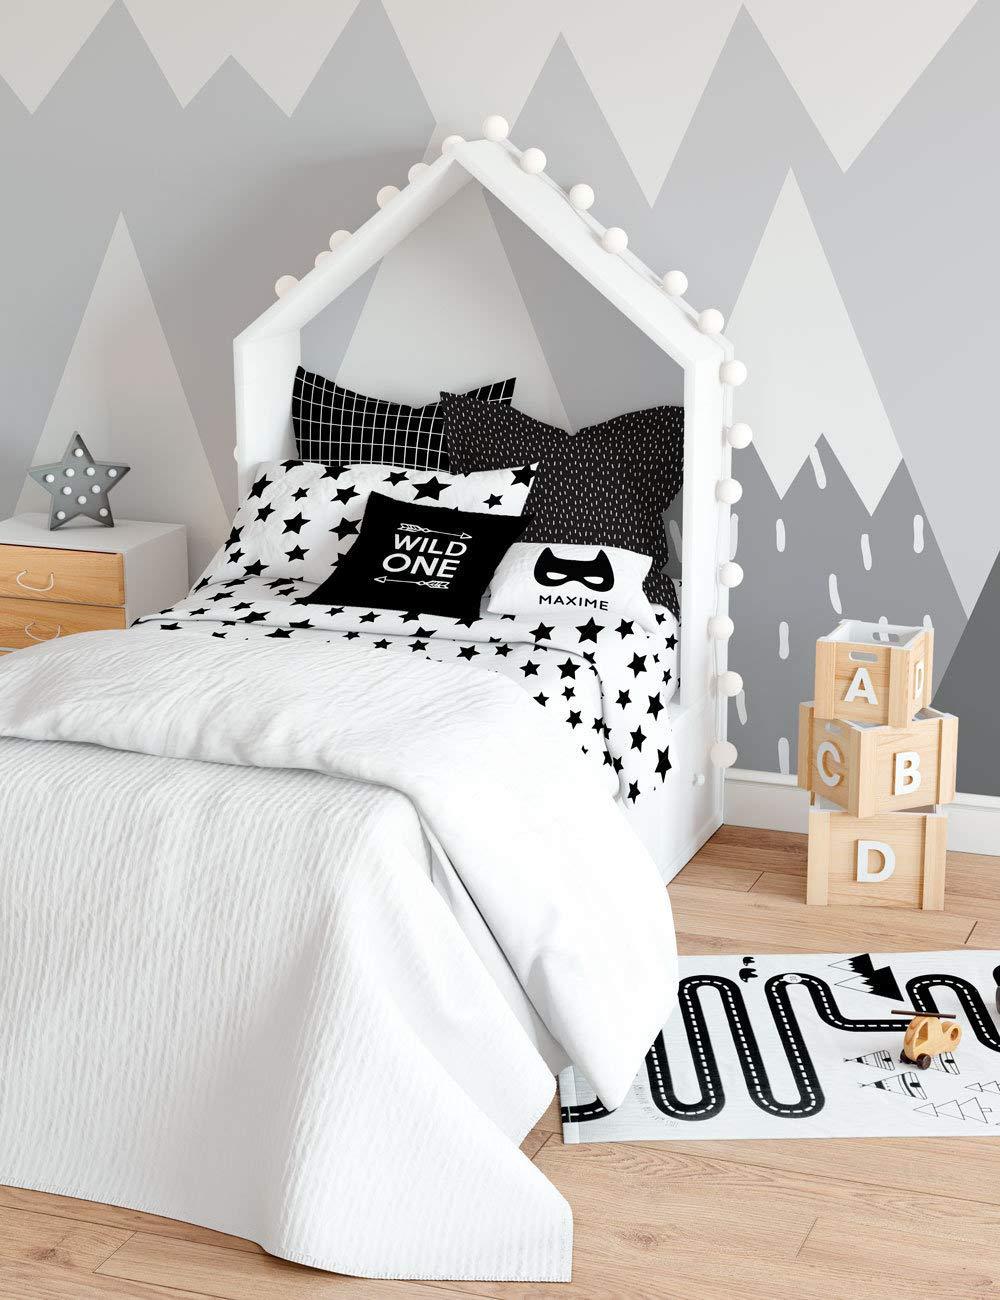 Amazon.com: Twin Kid Monochrome Stars Duvet Cover, Bedding Set For